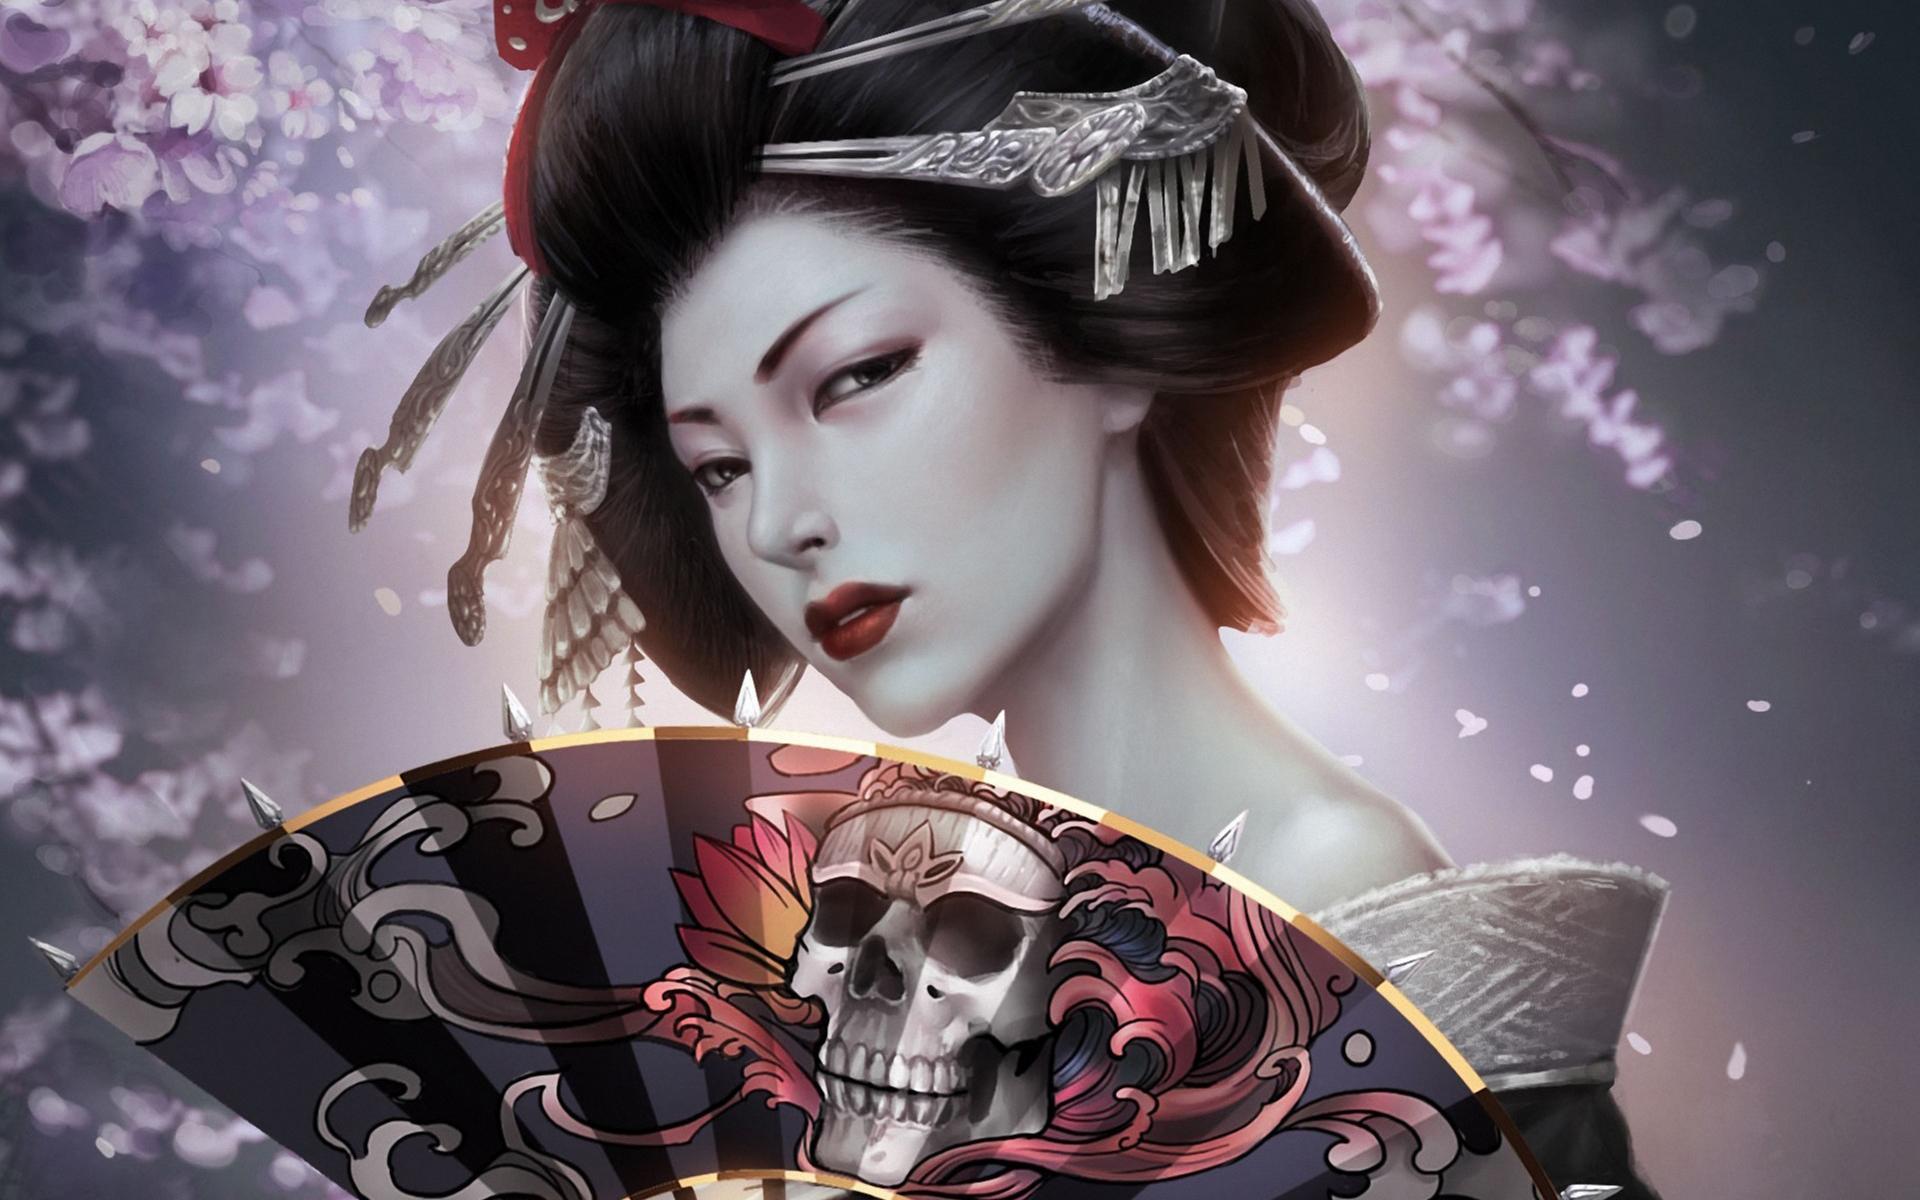 Girl Geisha Skull Art Hd Wallpapers Japanese Girl Geisha Skull 1920x1200